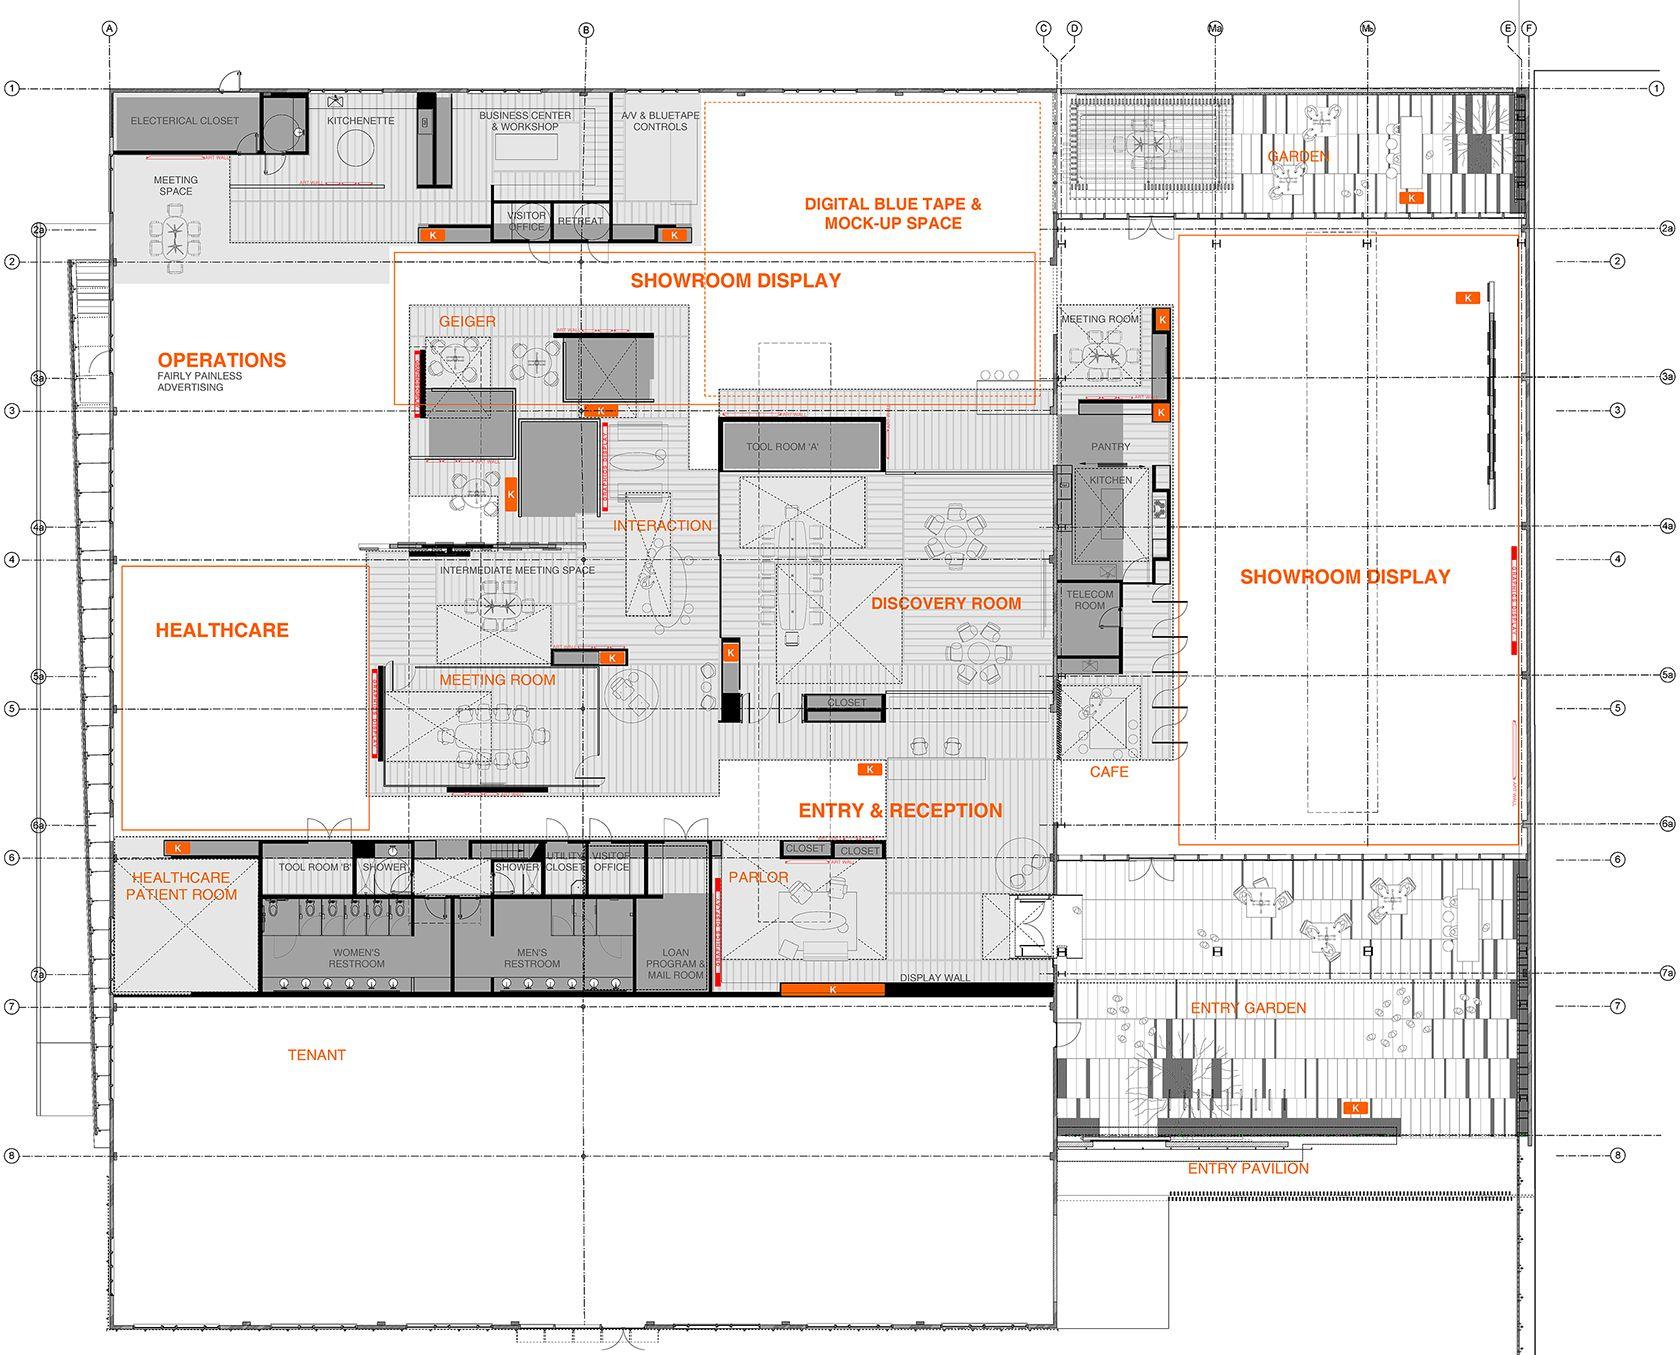 floor plan | herman miller national design center | diagrams ...